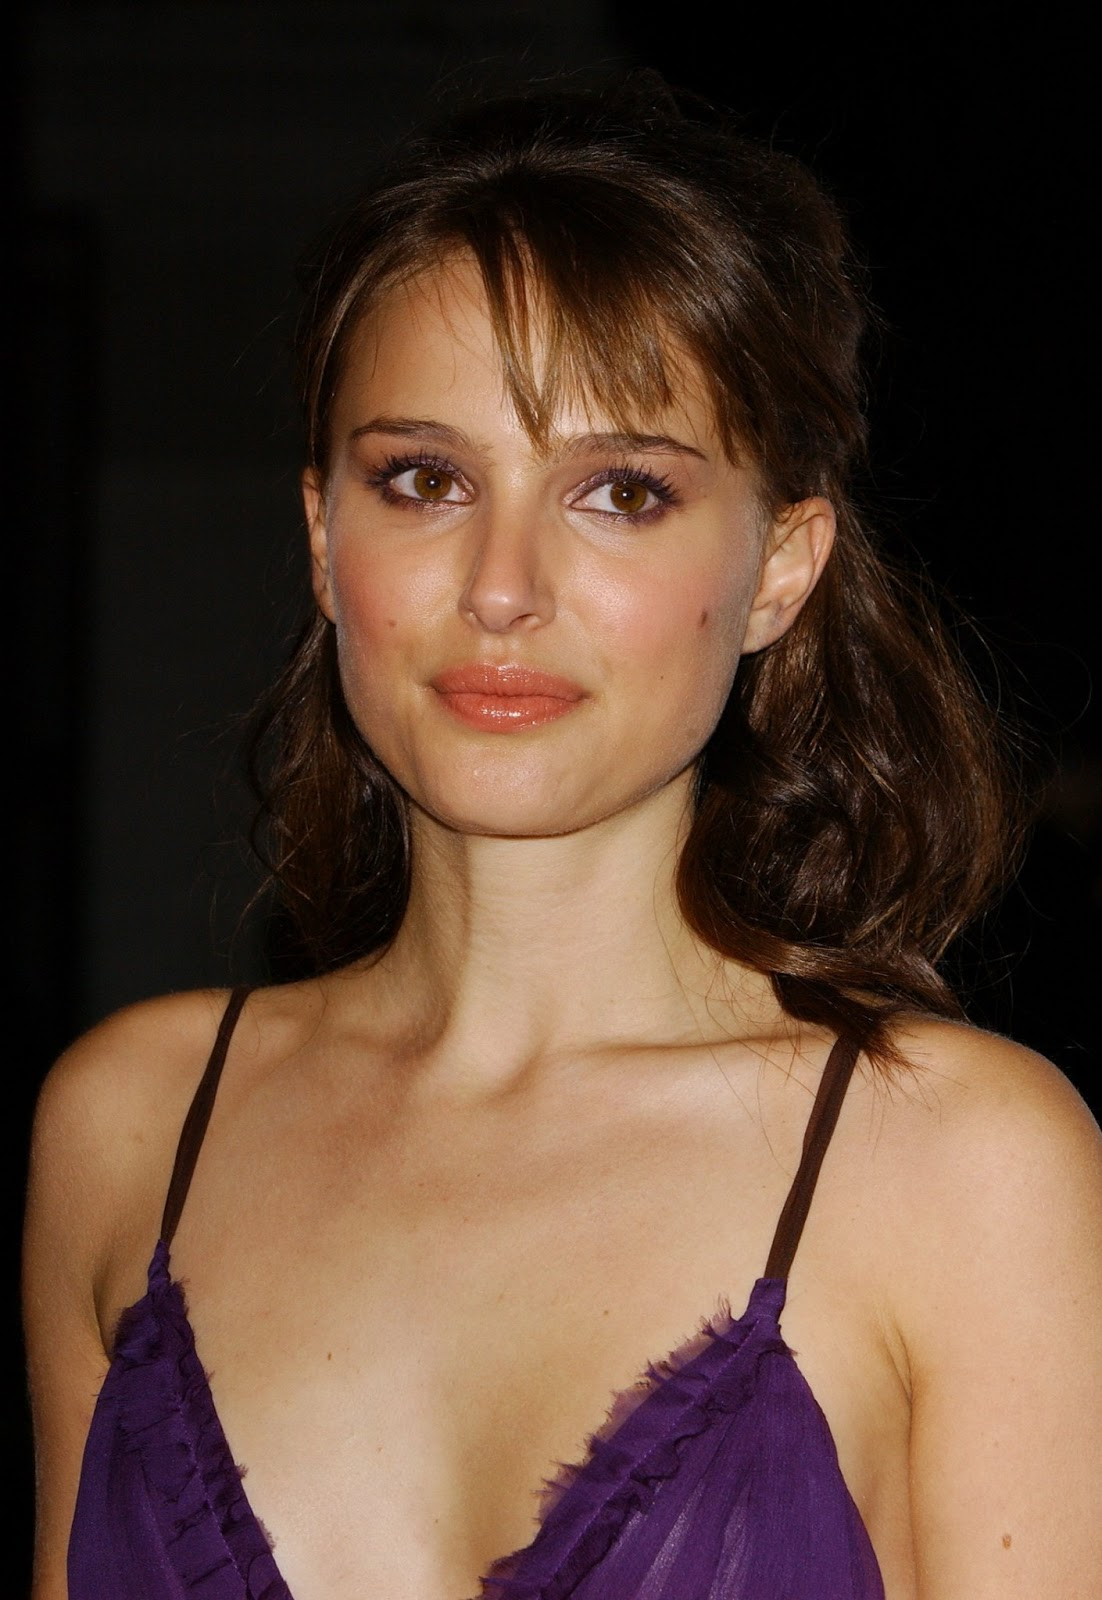 Natalie Portman models,celebrity natalie portman,access hollywood ... Natalie Portman